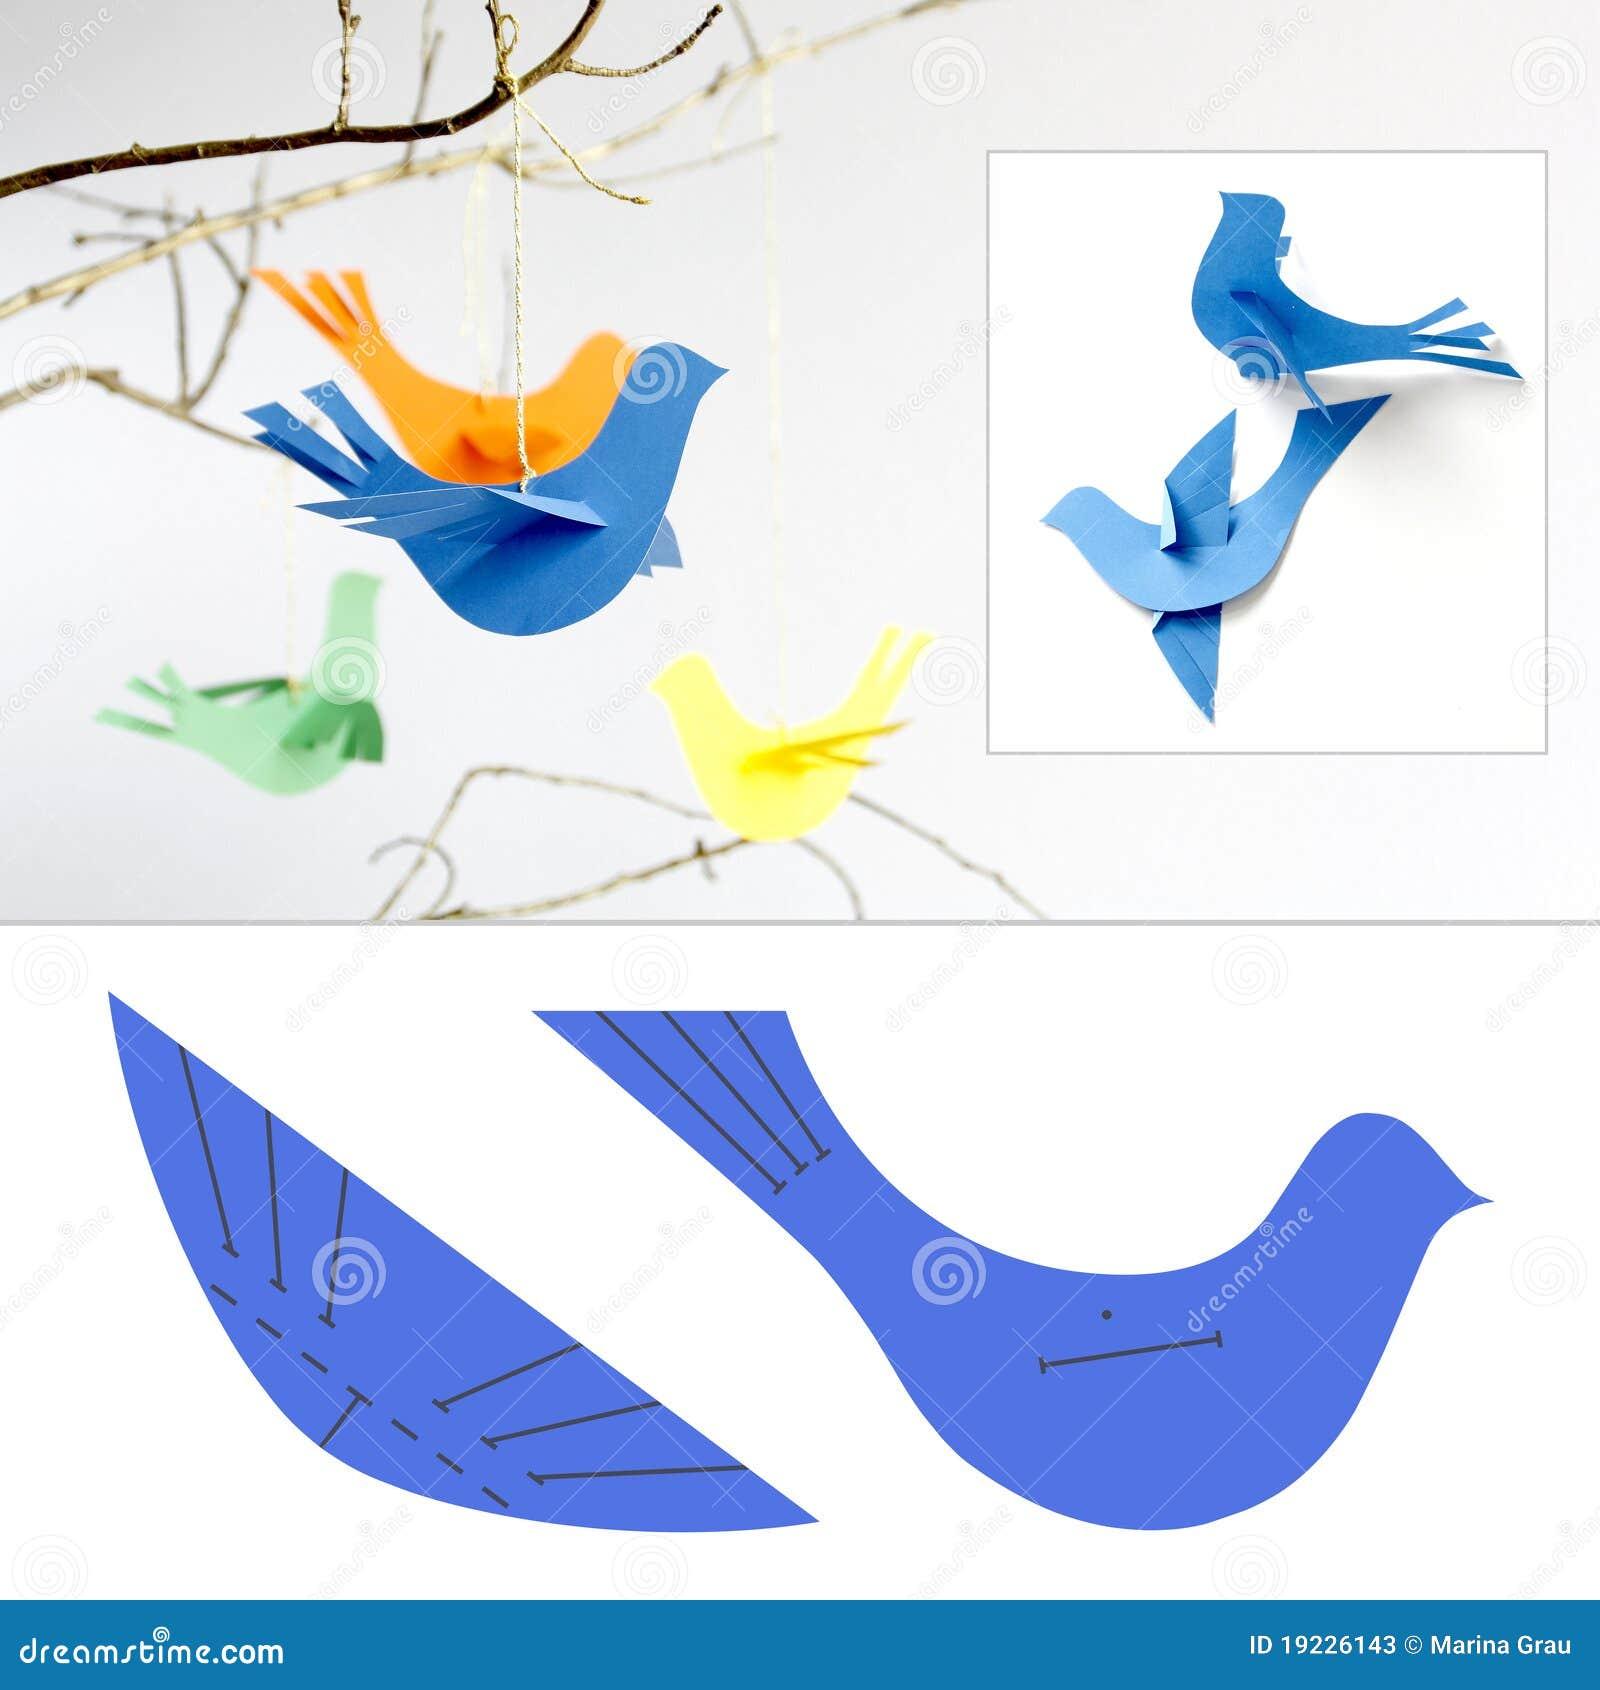 oiseaux de papier illustration stock illustration du. Black Bedroom Furniture Sets. Home Design Ideas